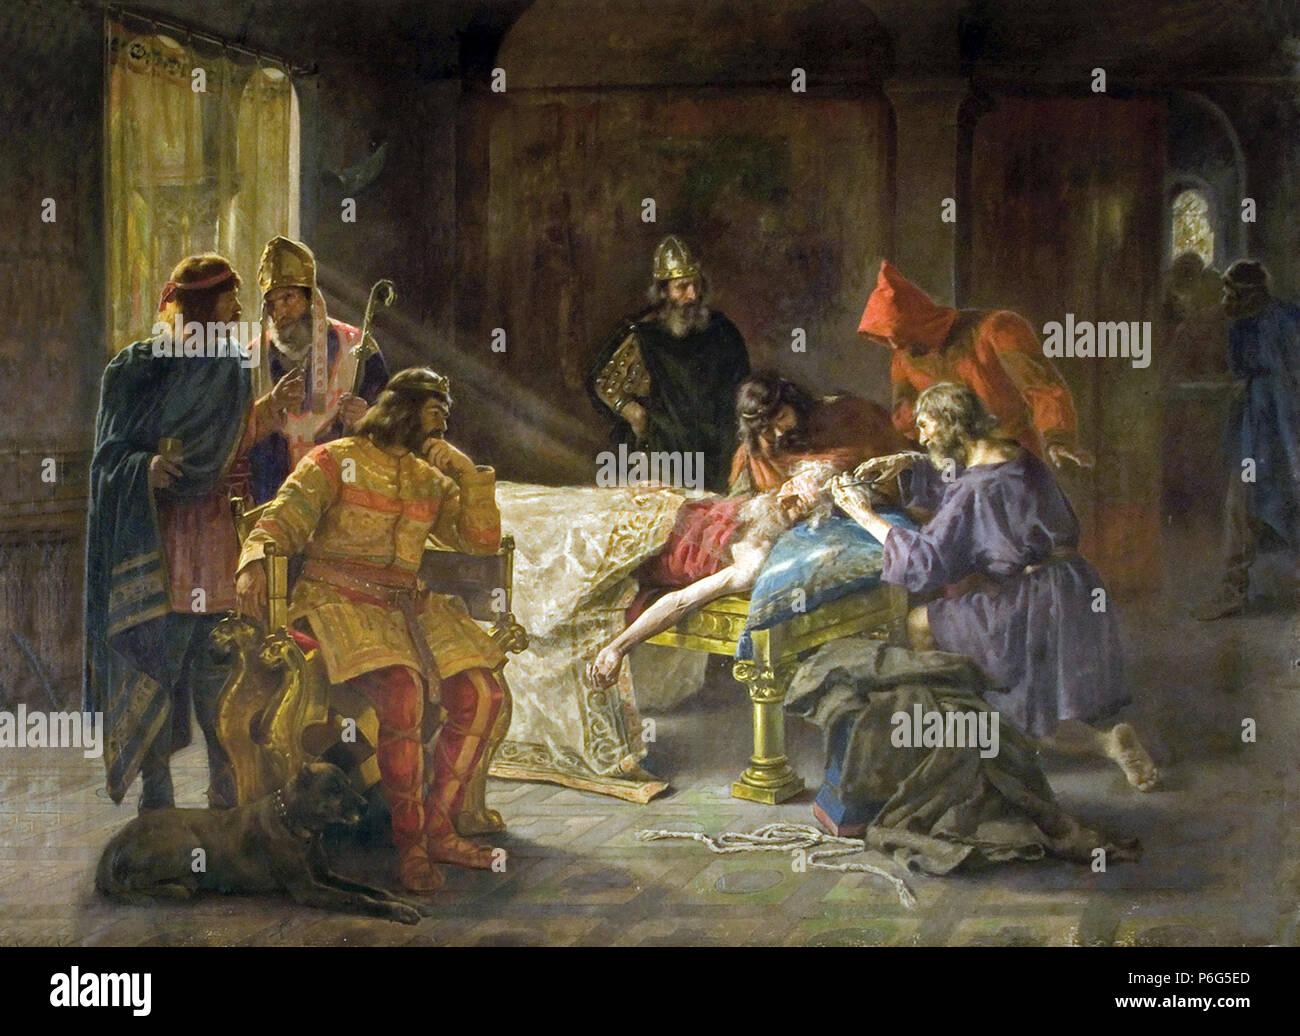 . Deutsch: La tonsura del Rei Wamba. Deutsch: La tonsura del Rei Wamba. (1894 c) 66 La tonsura del Rei Wamba - Joan brull ich Vinyoles (1863-1912) Stockfoto